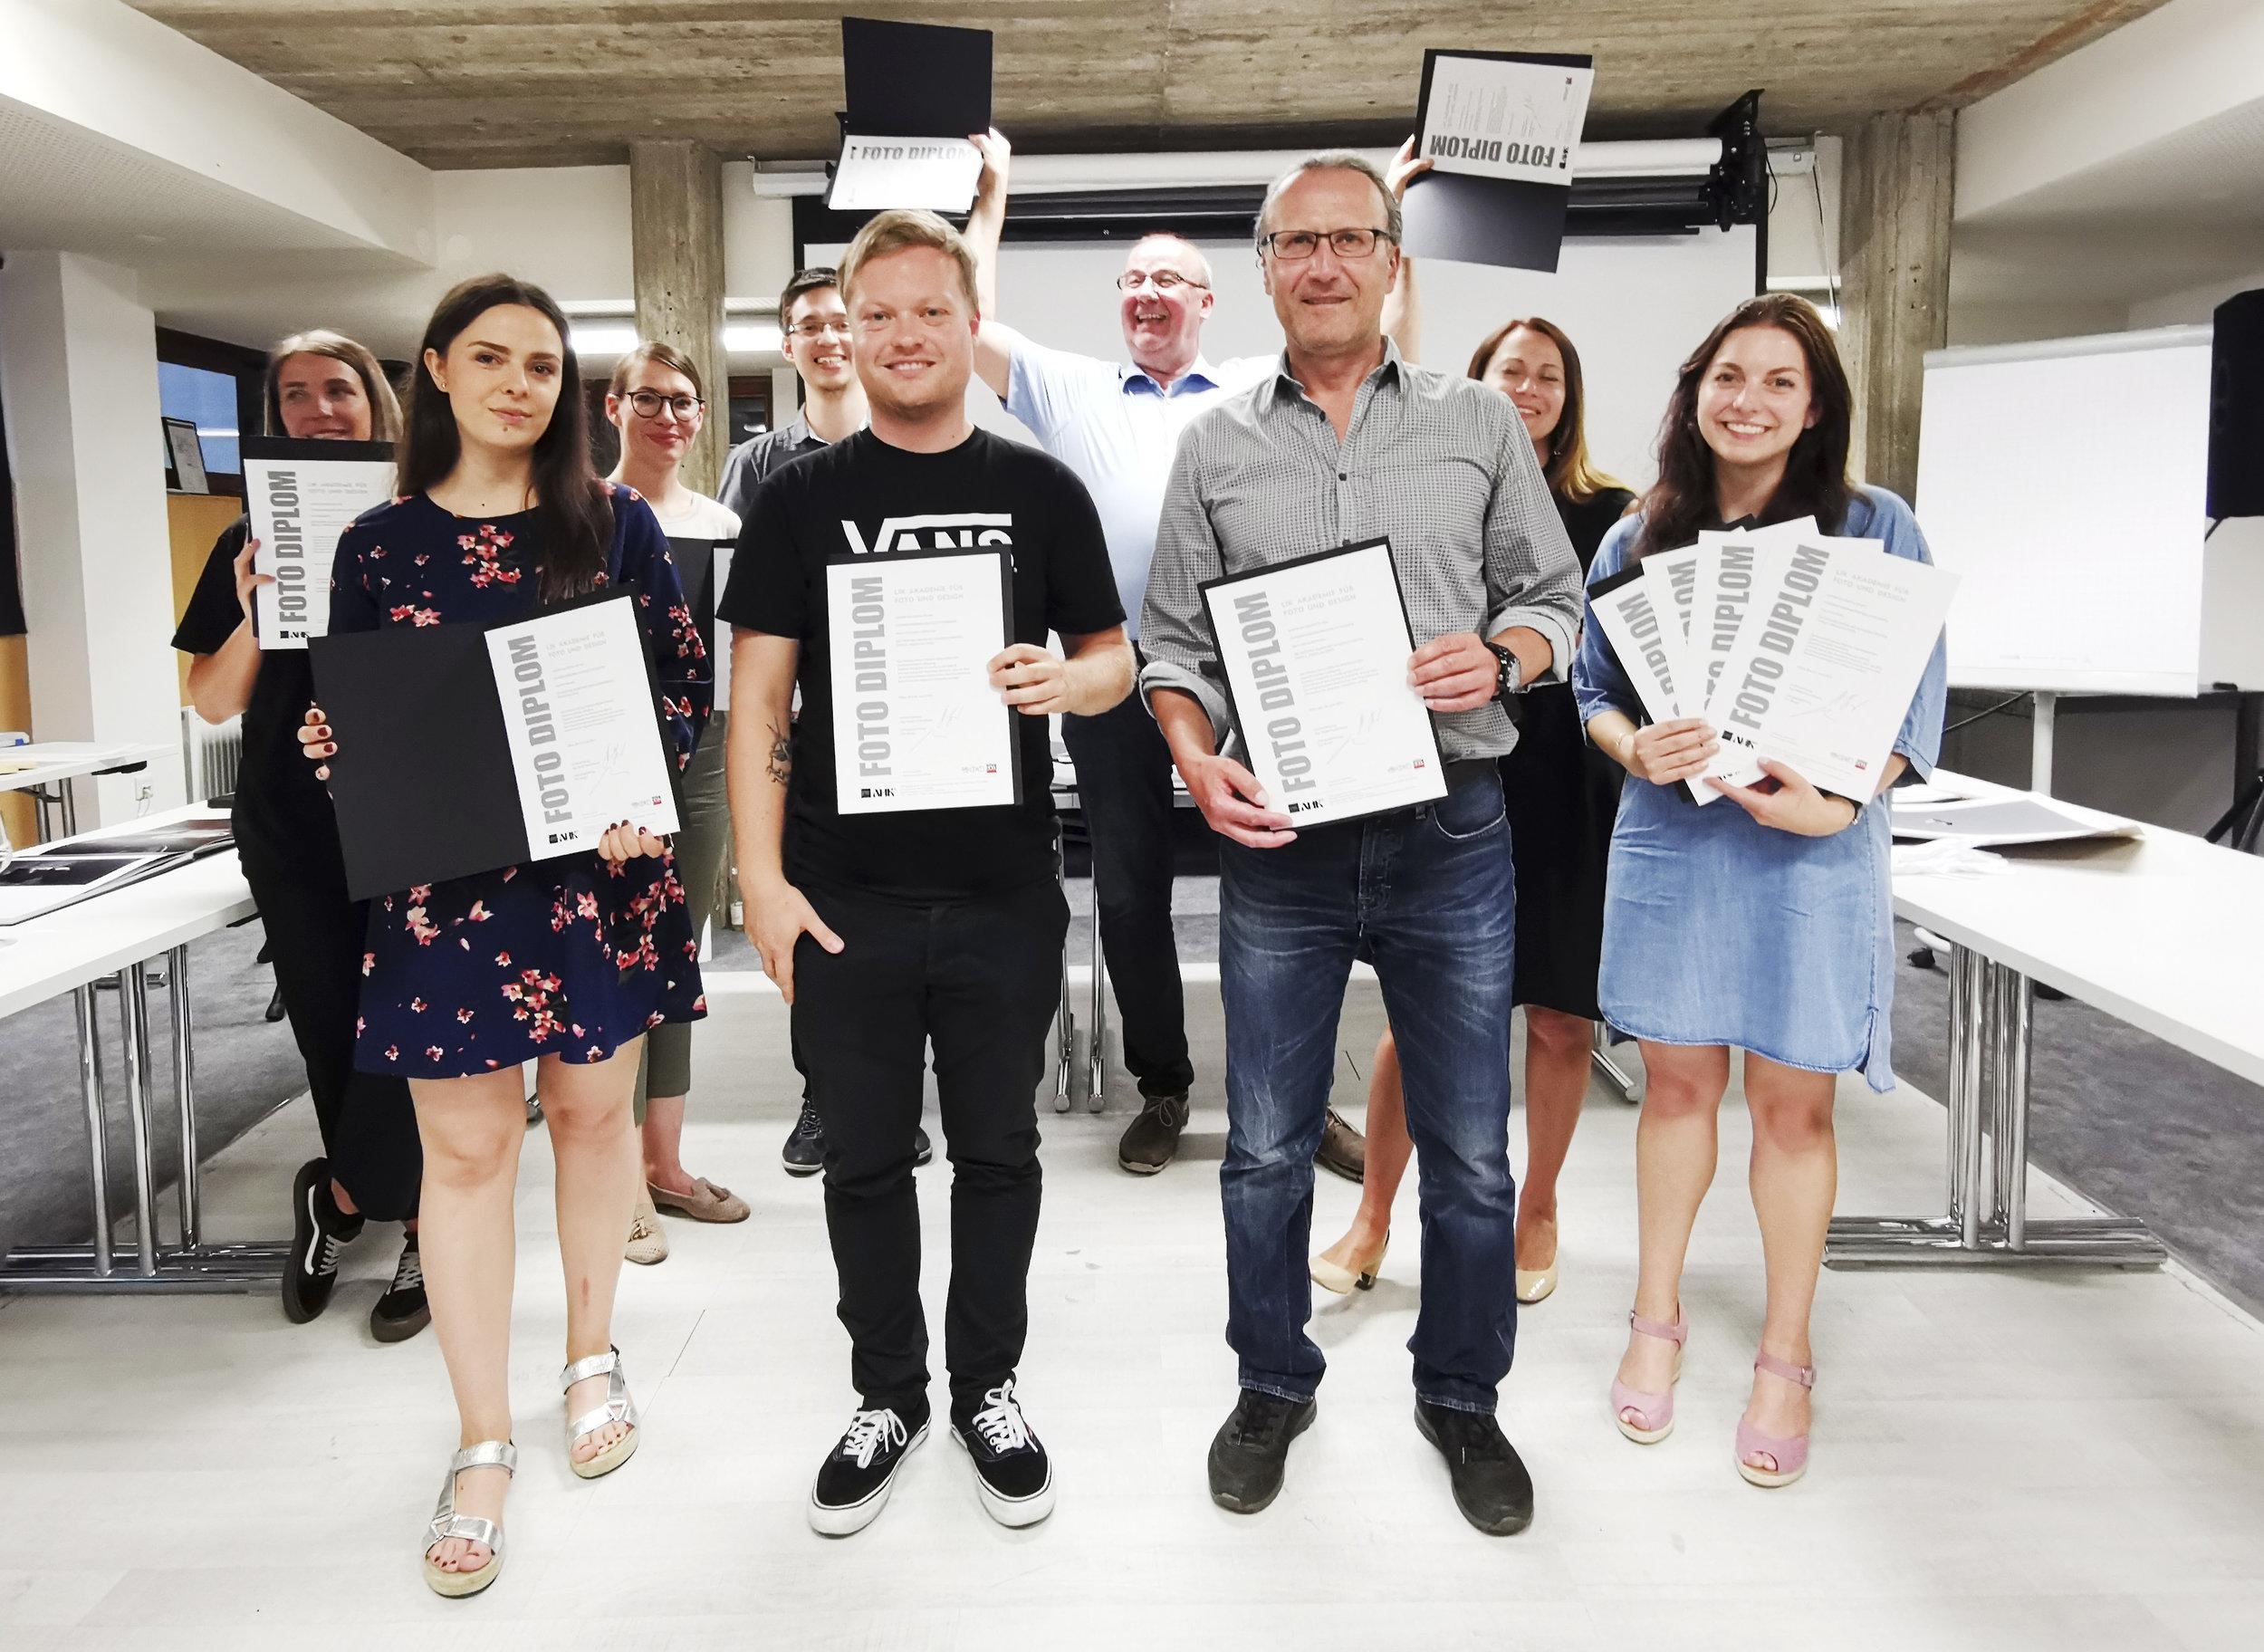 Absolventen des LIK Diplomlehrgang digitale Fotografie in Graz